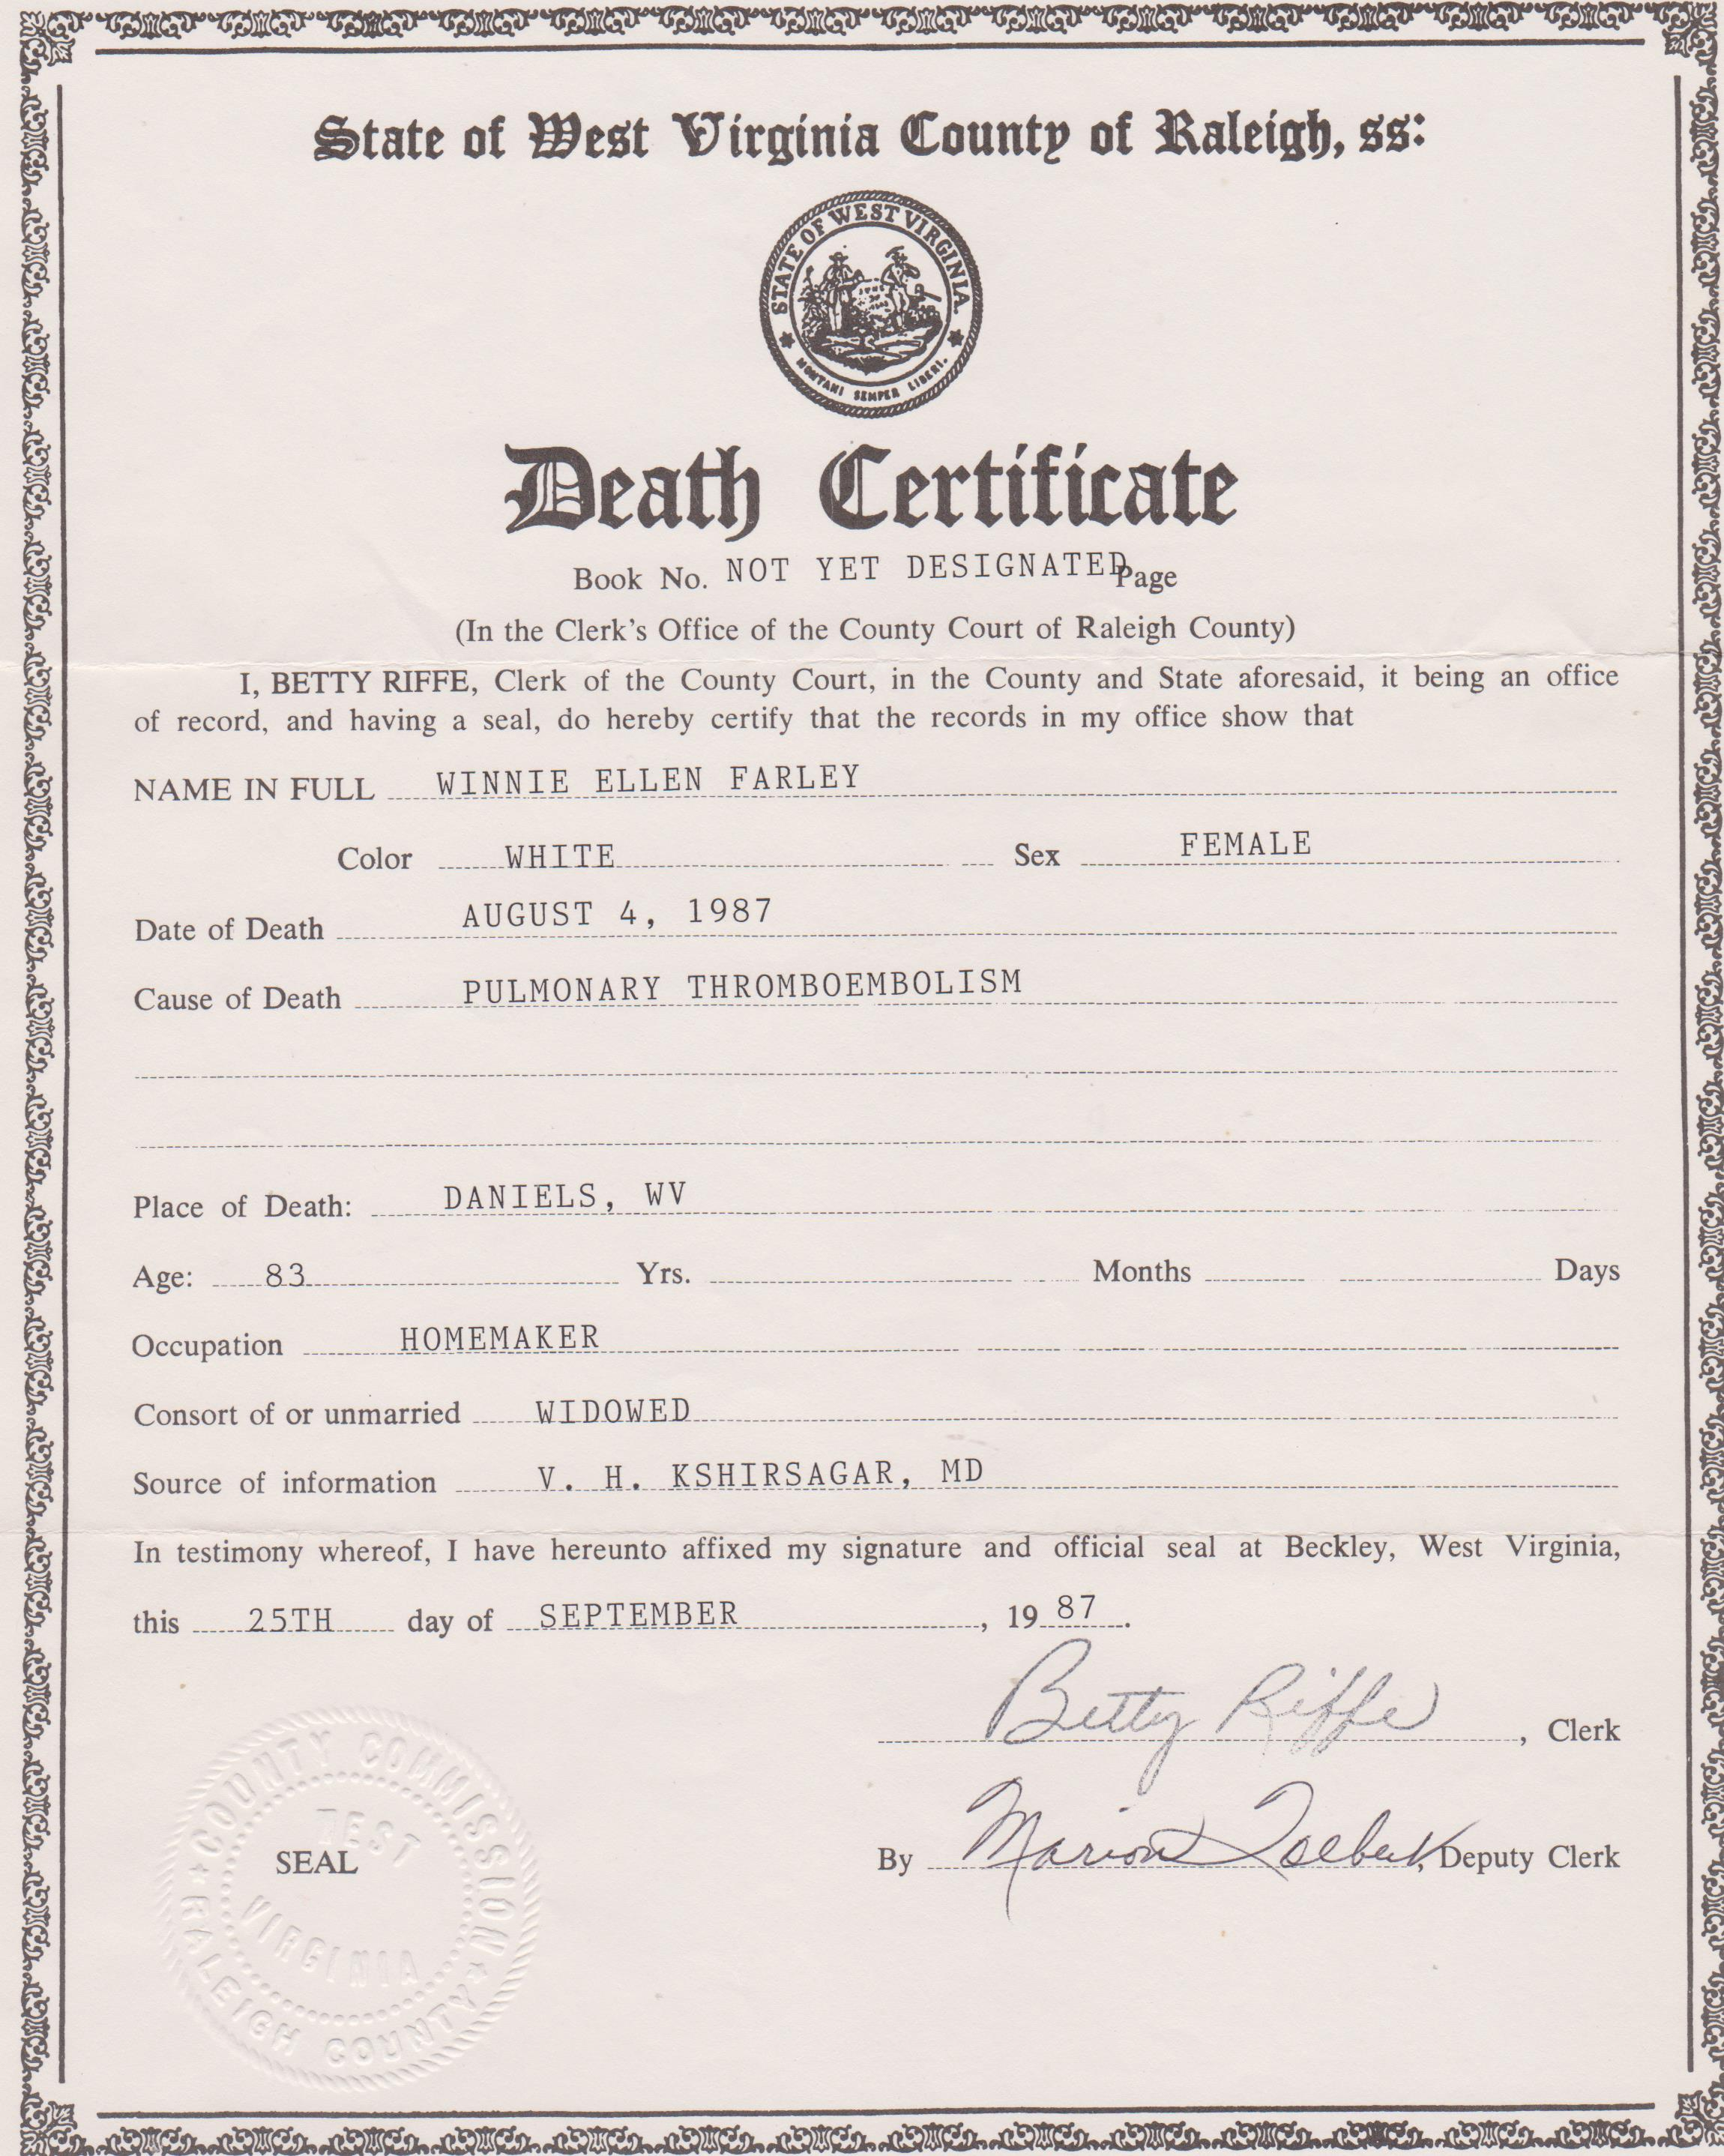 Winnie ellen bolen hall farley 1904 1987 find a grave memorial death certificate for winnie ellen bolen hall farley aiddatafo Gallery